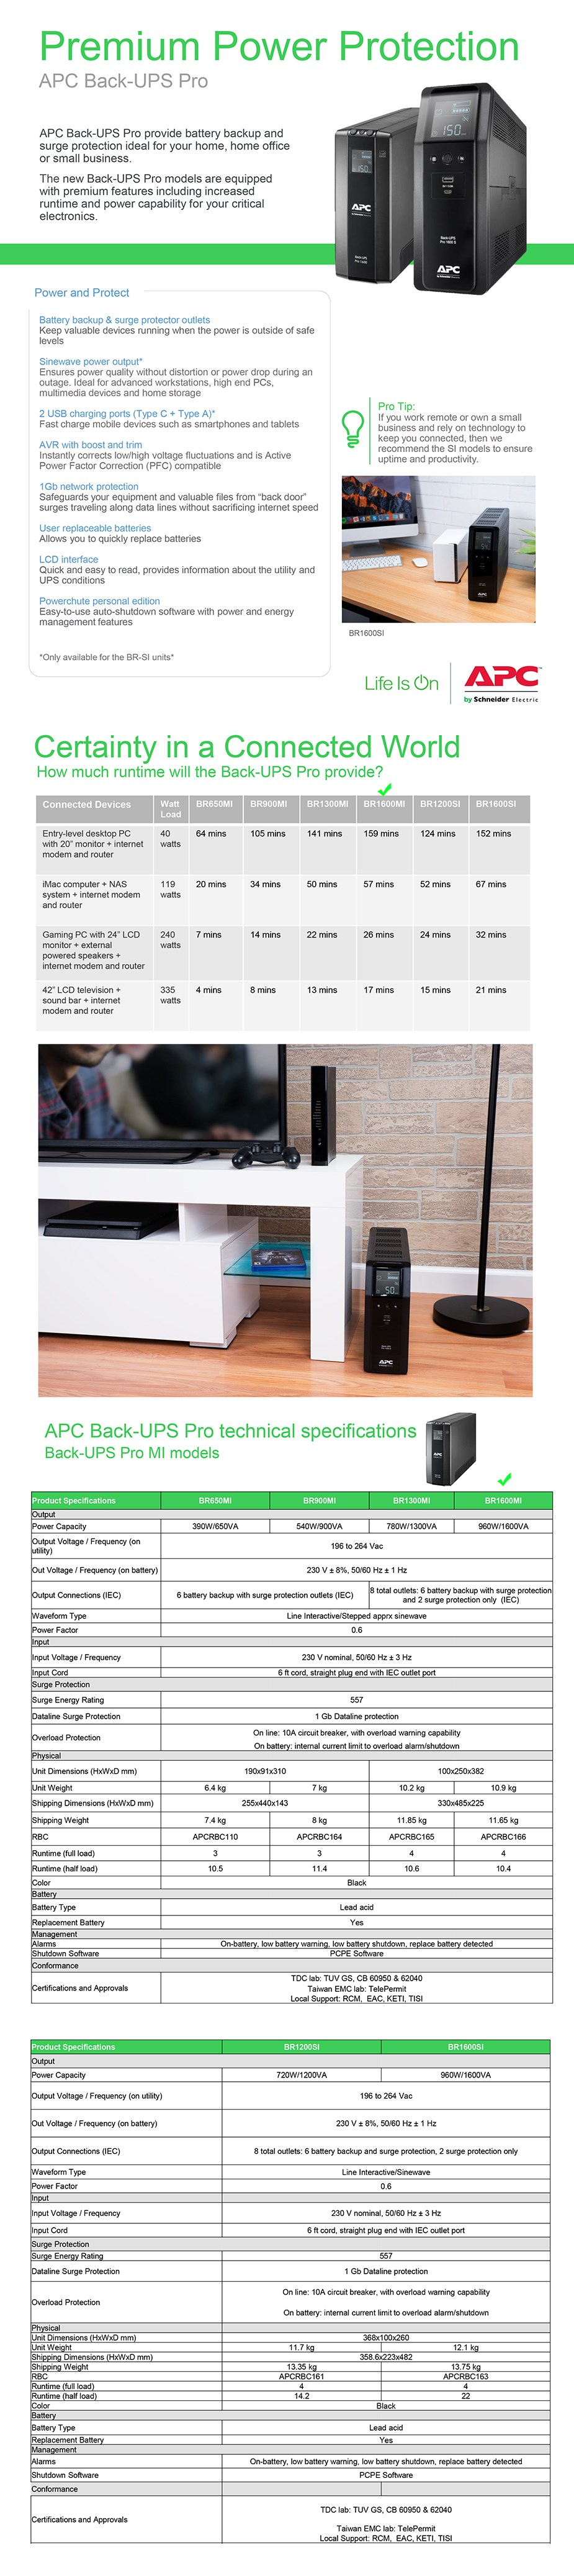 apc-br1600mi-back-ups-pro-1600va960w-line-interactive-ups-ac33521-4.jpg